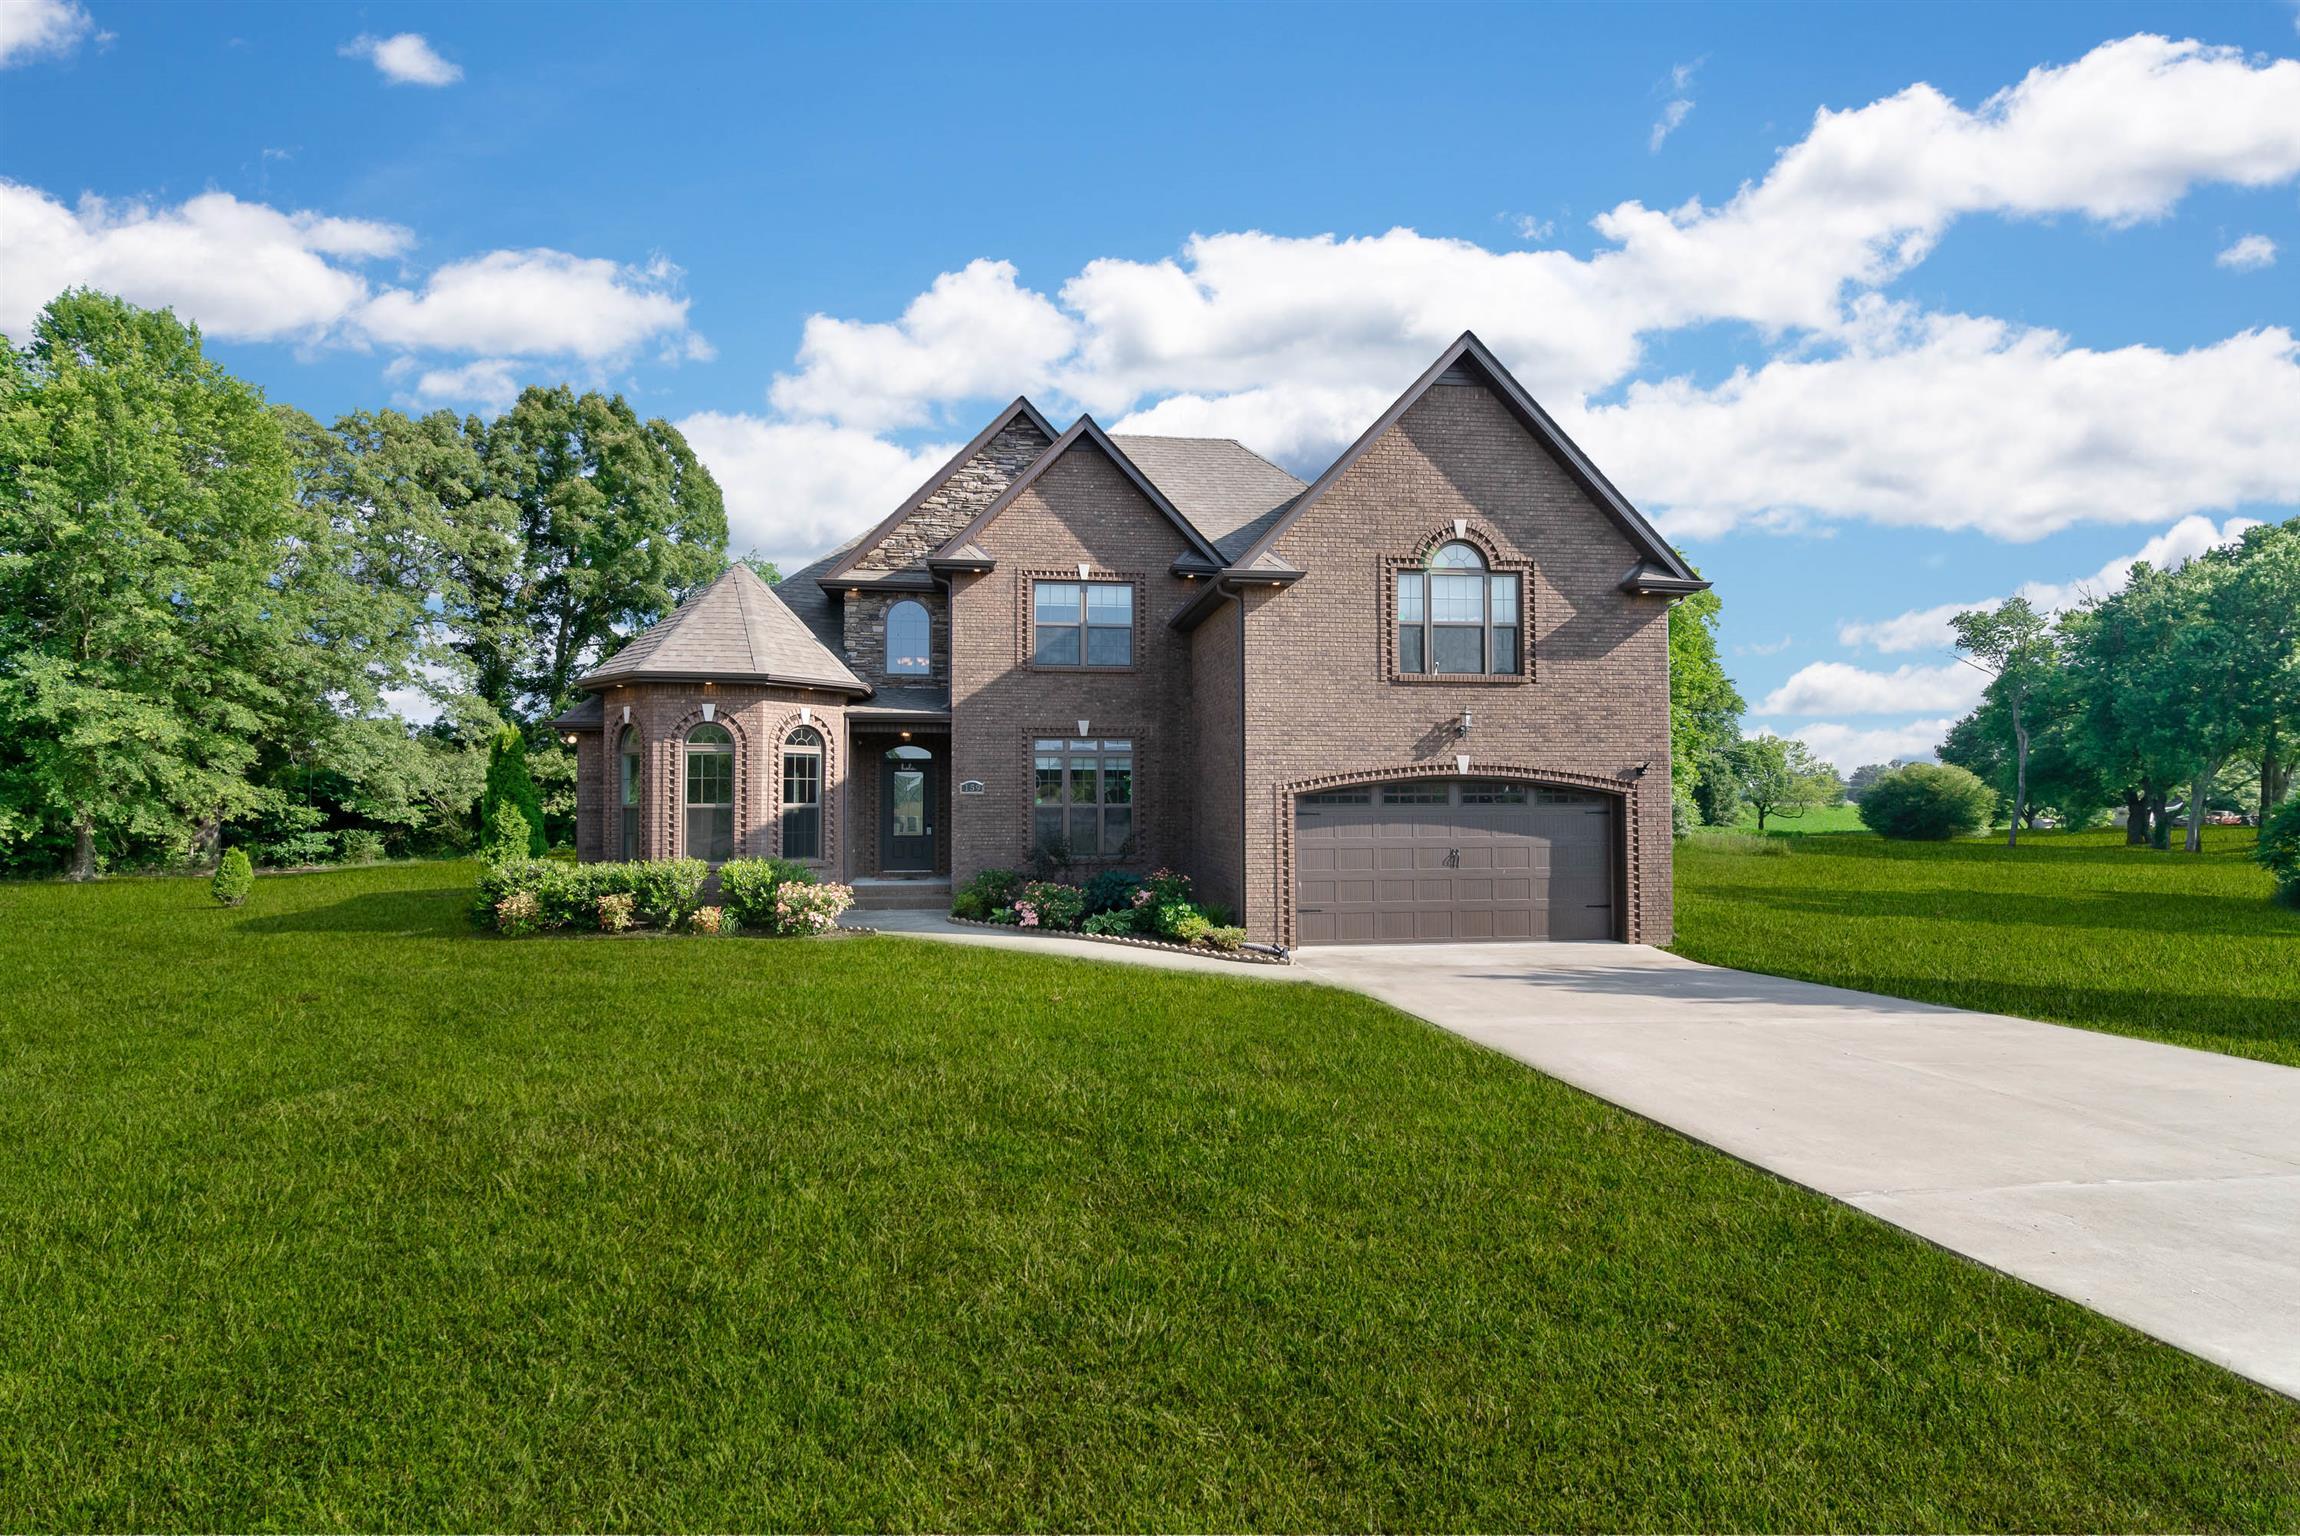 159 Kendall Ct, Pleasant View, TN 37146 - Pleasant View, TN real estate listing